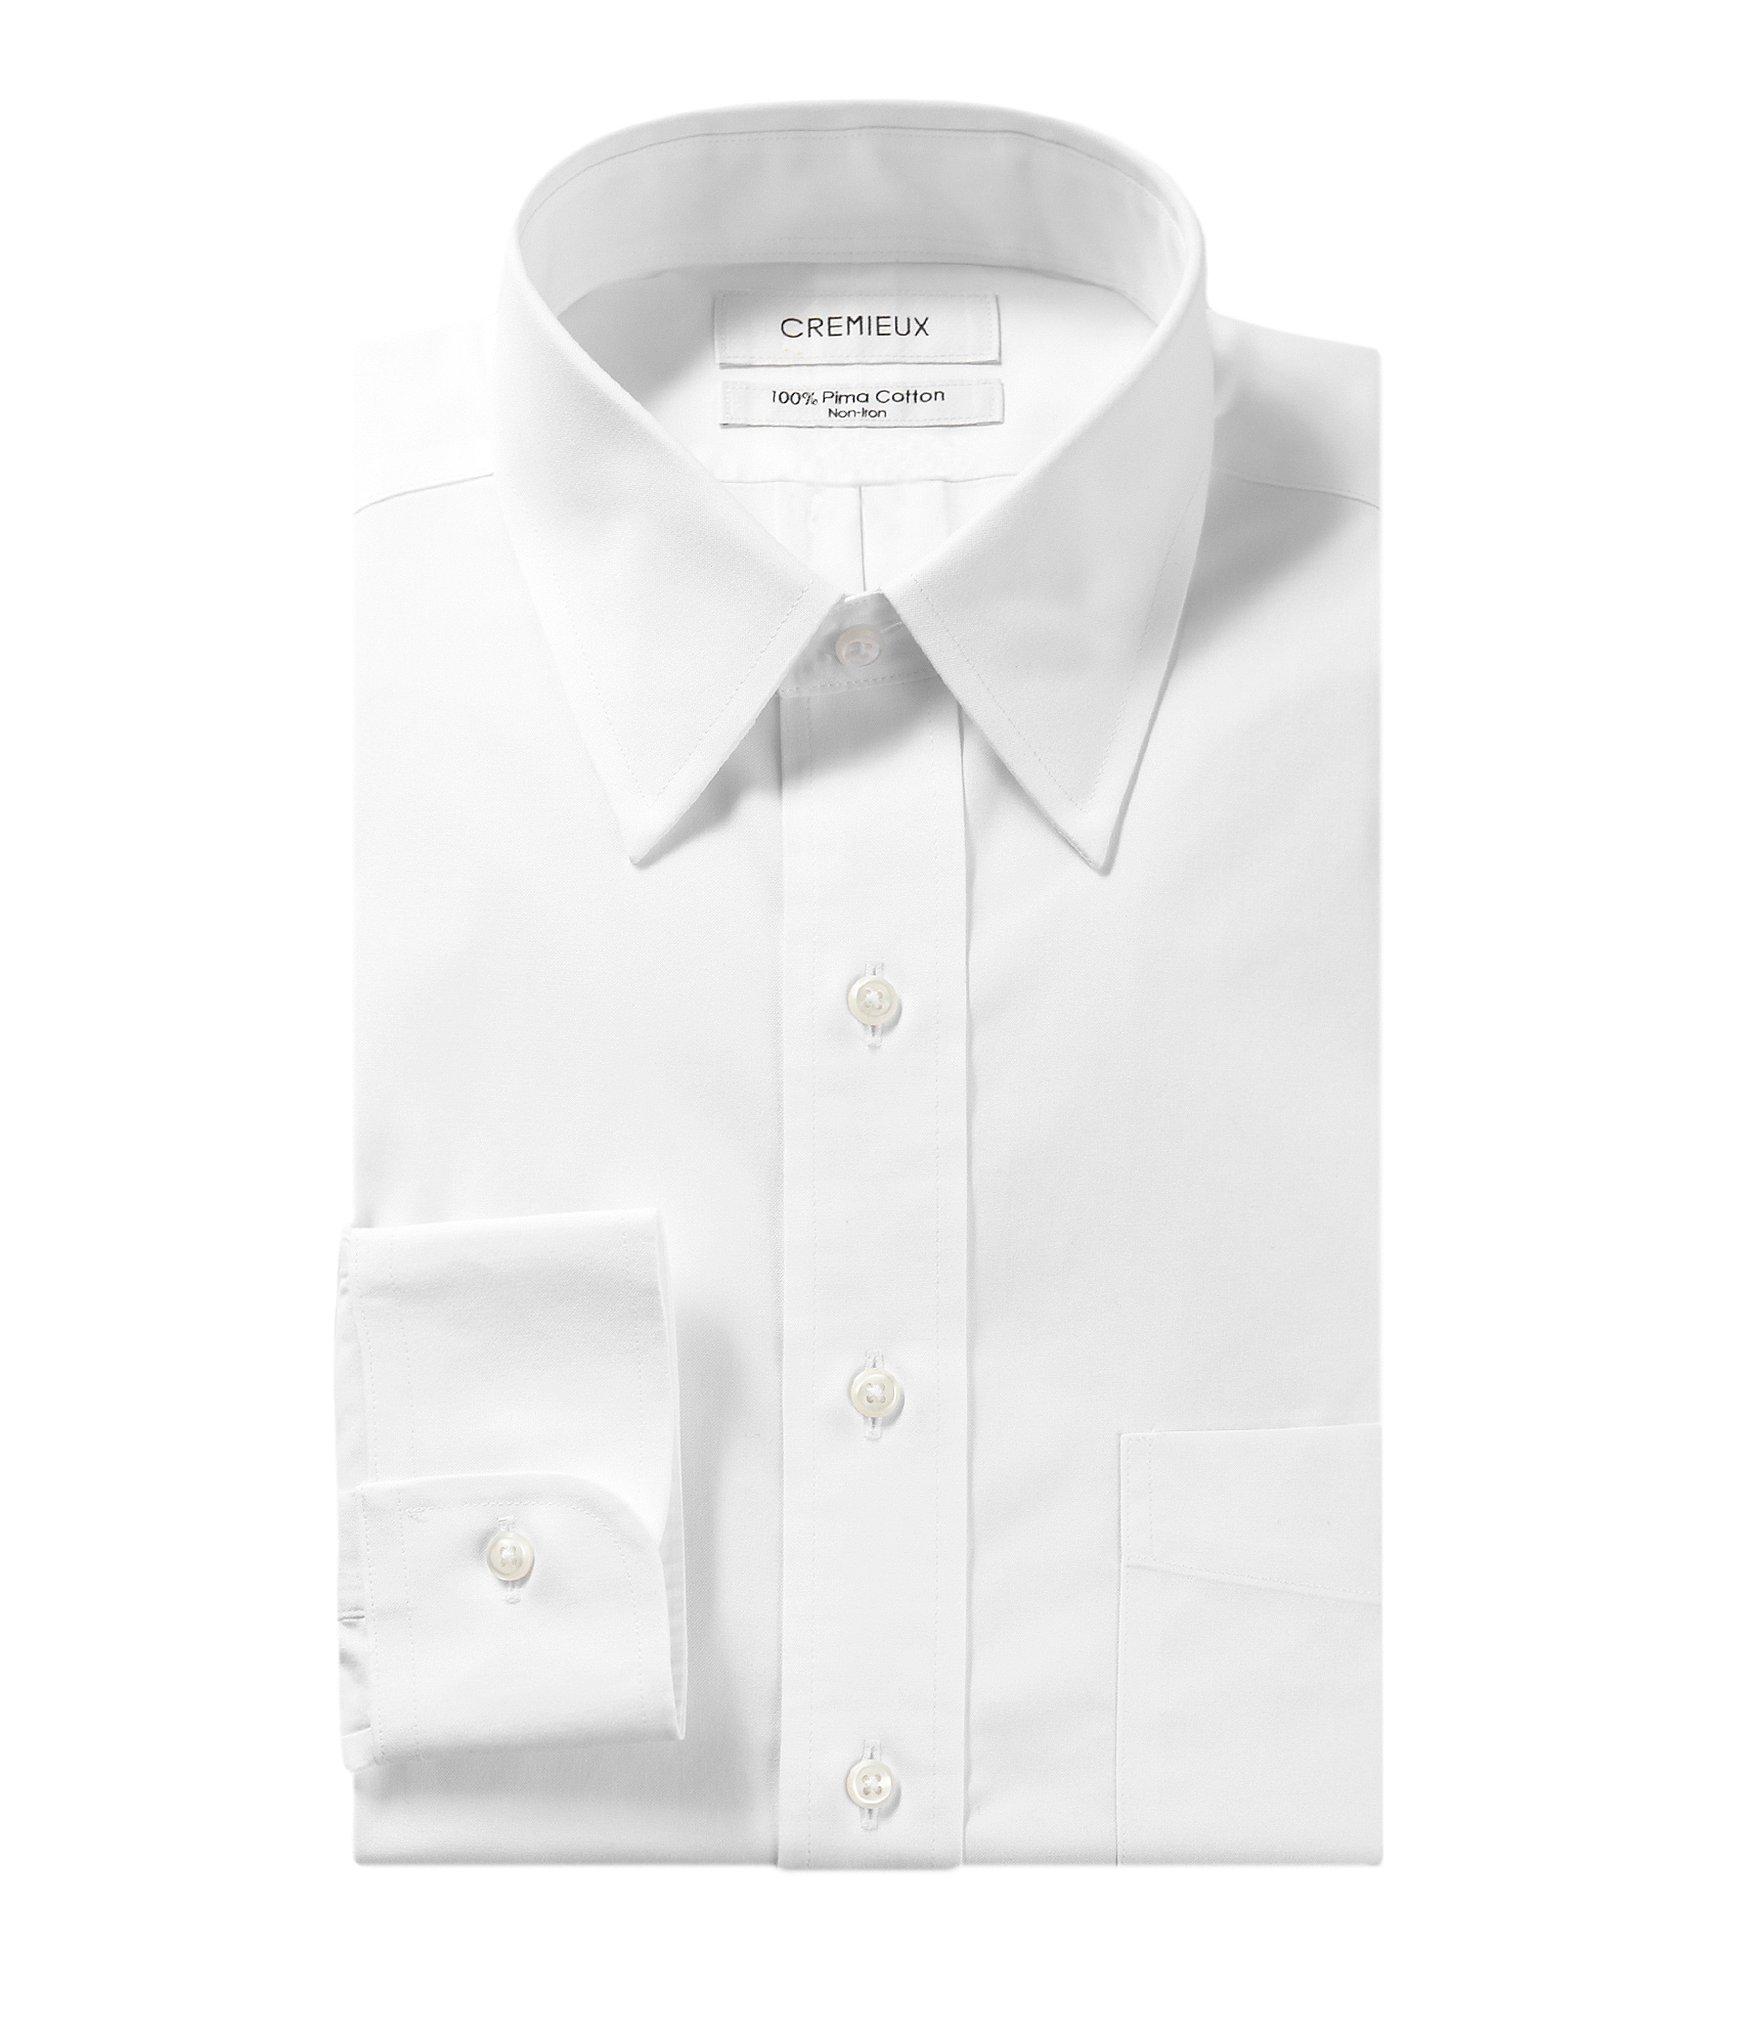 Cremieux Men\'s Dress Shirts | Dillards